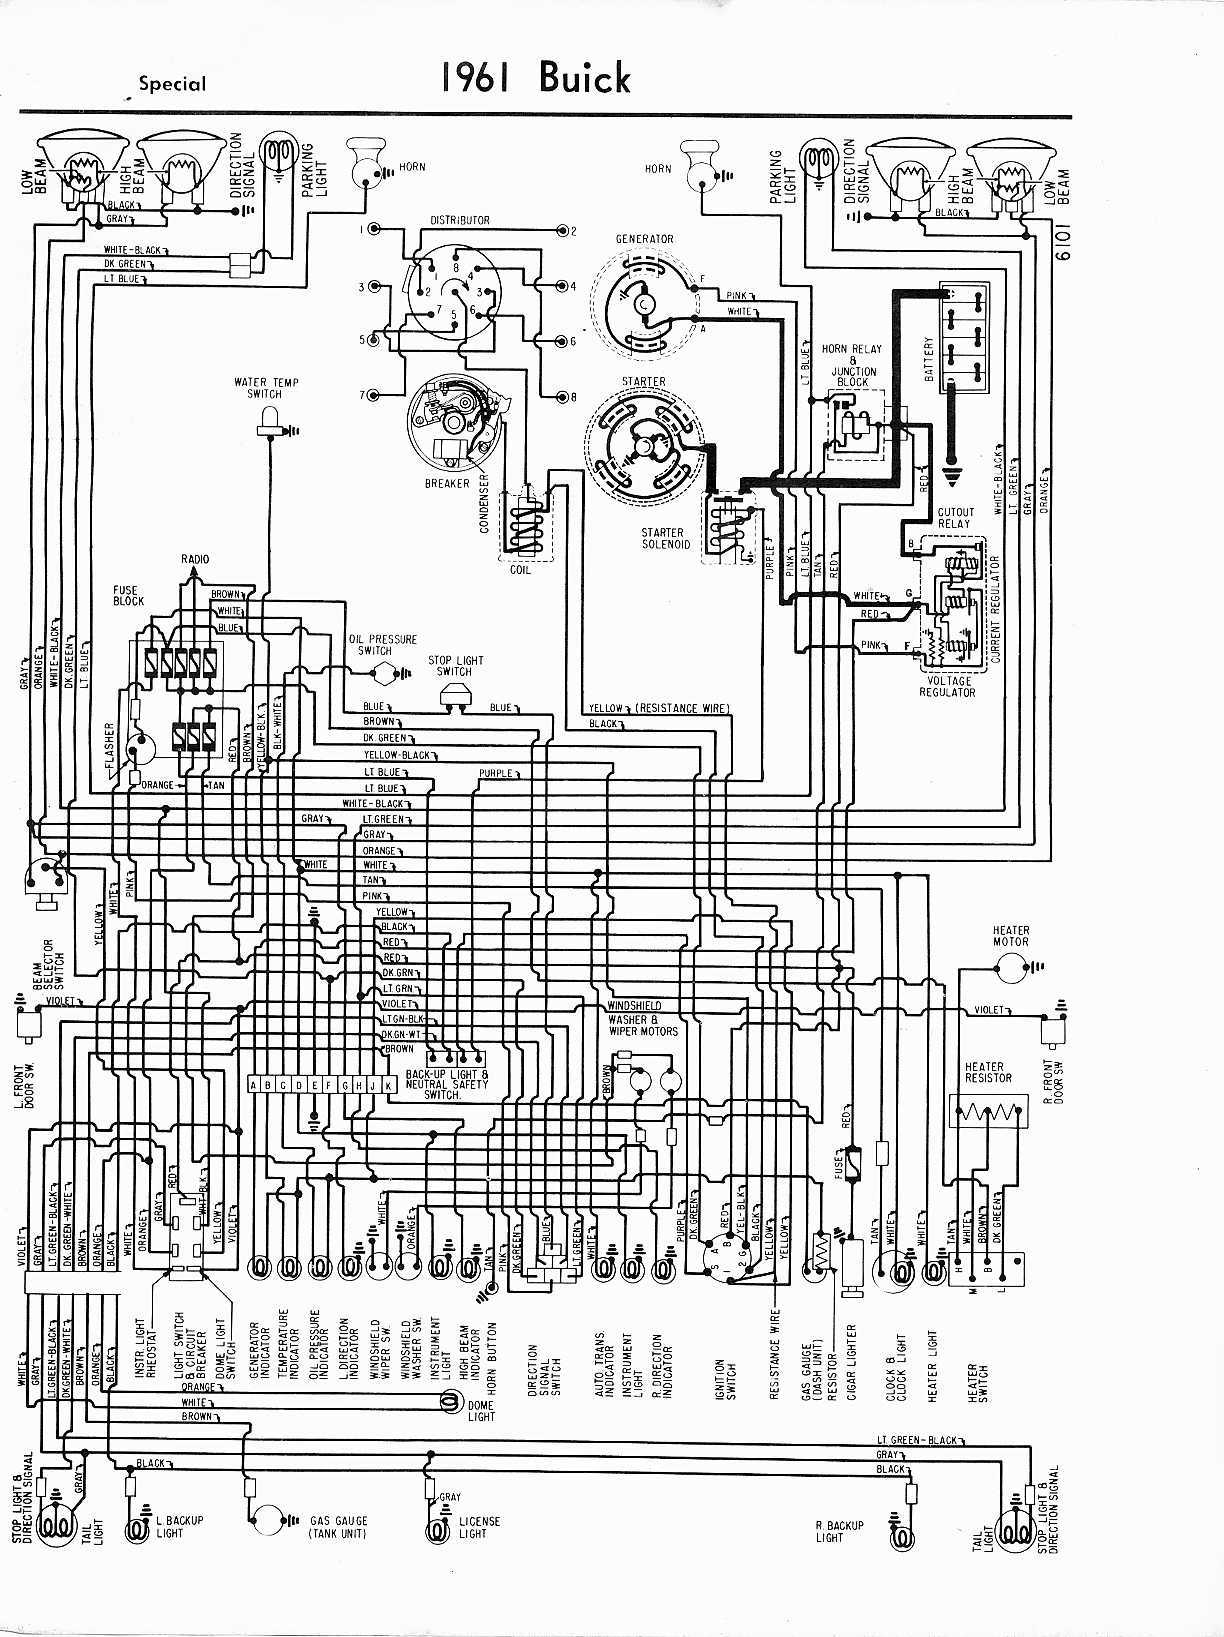 Astounding Buick Wiring Diagrams 1957 1965 Wiring Cloud Domeilariaidewilluminateatxorg